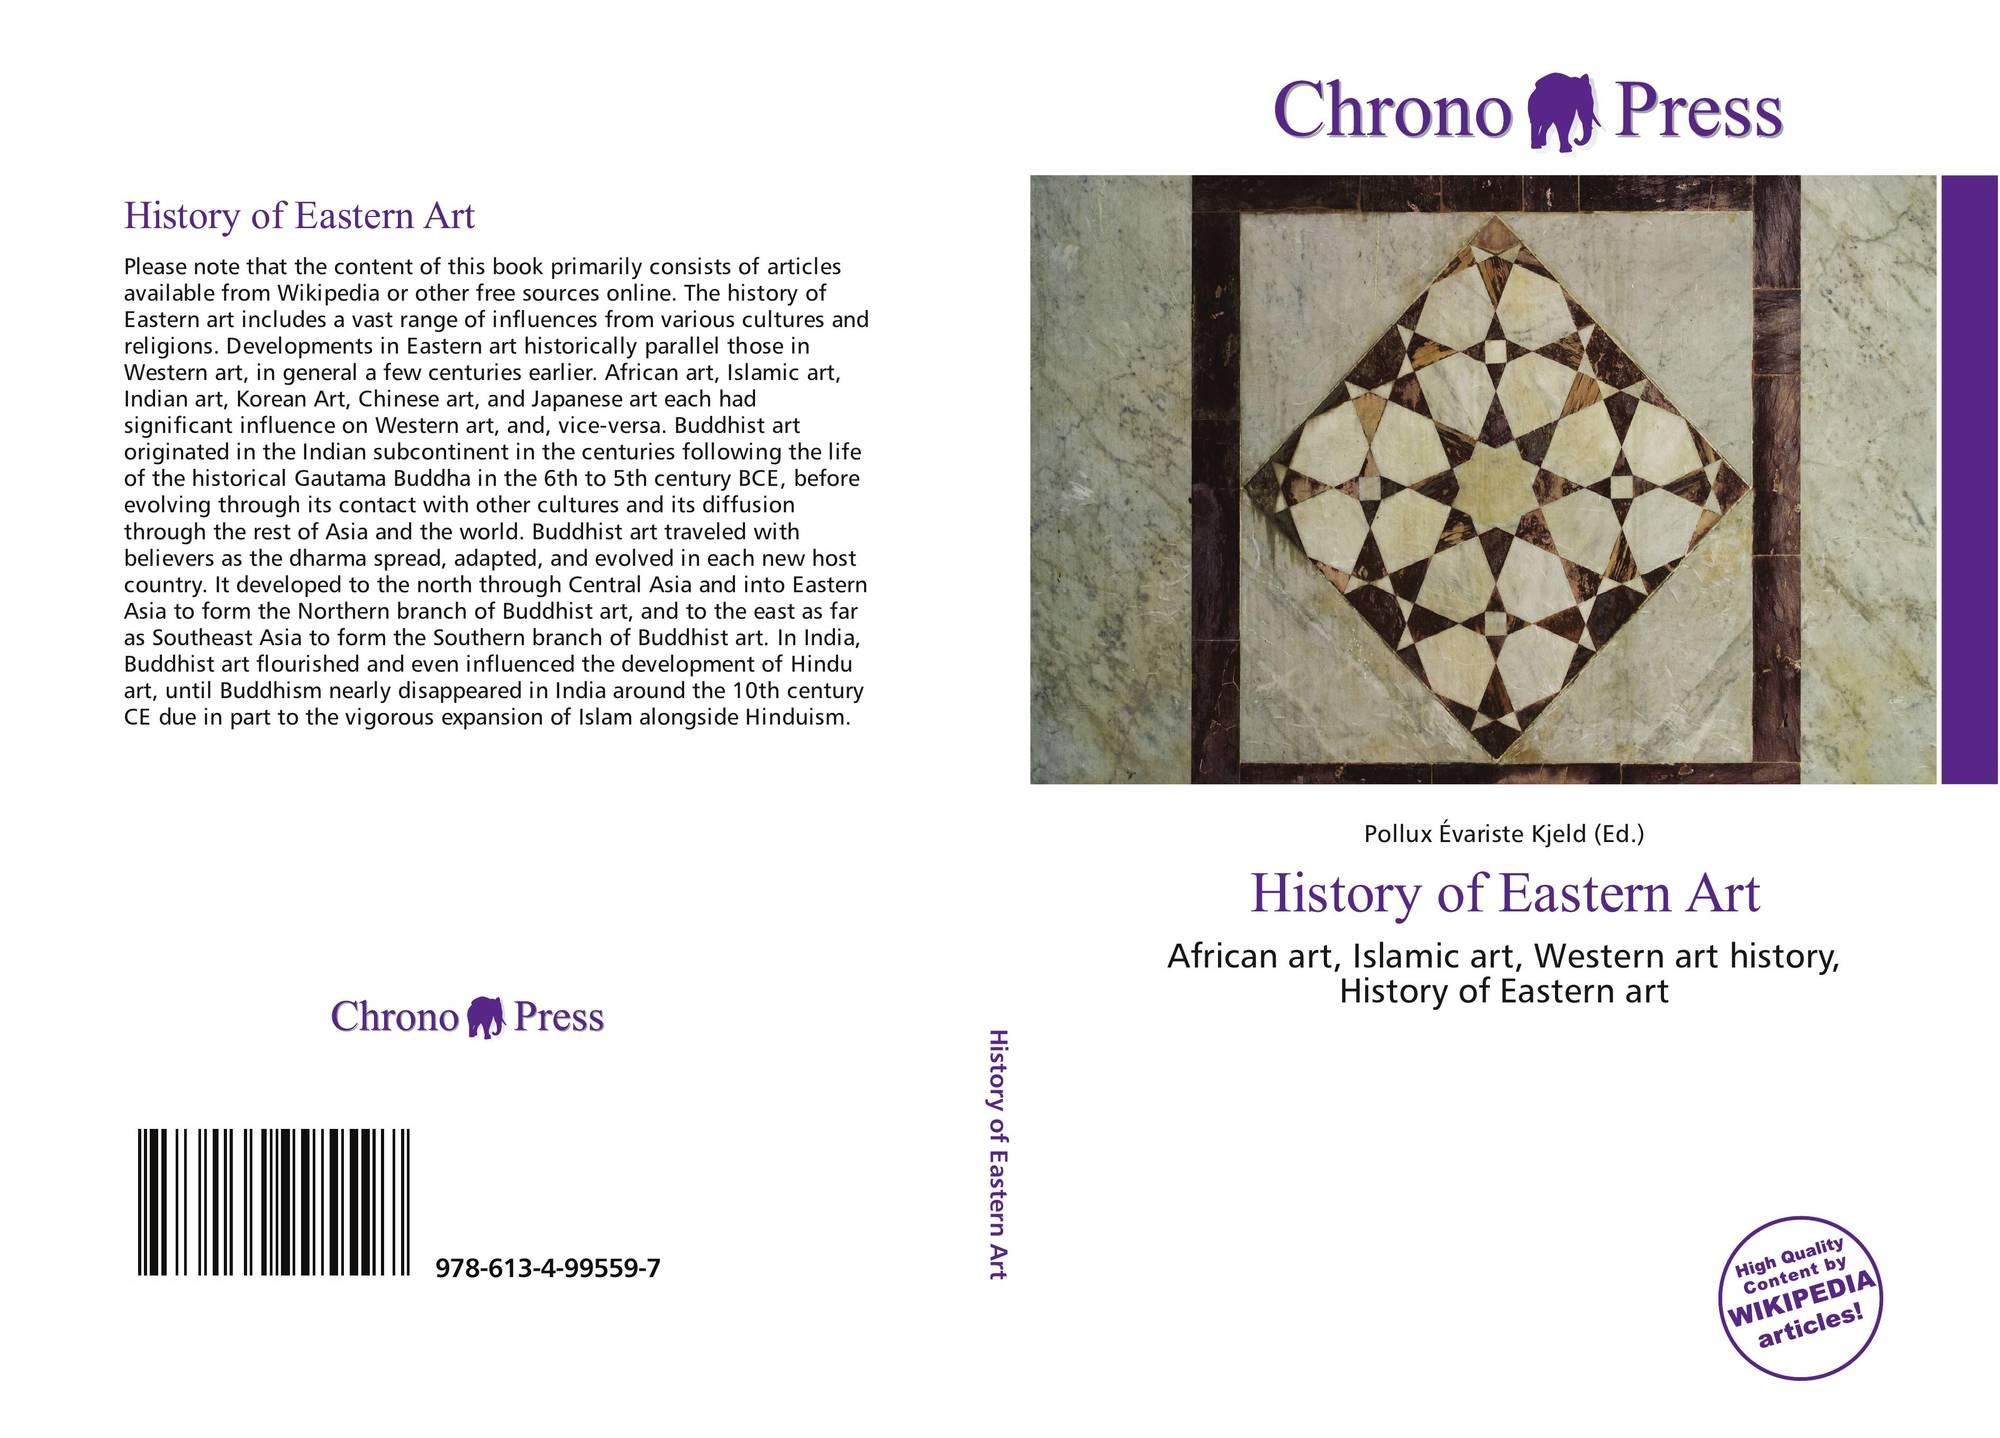 an analysis of art history books